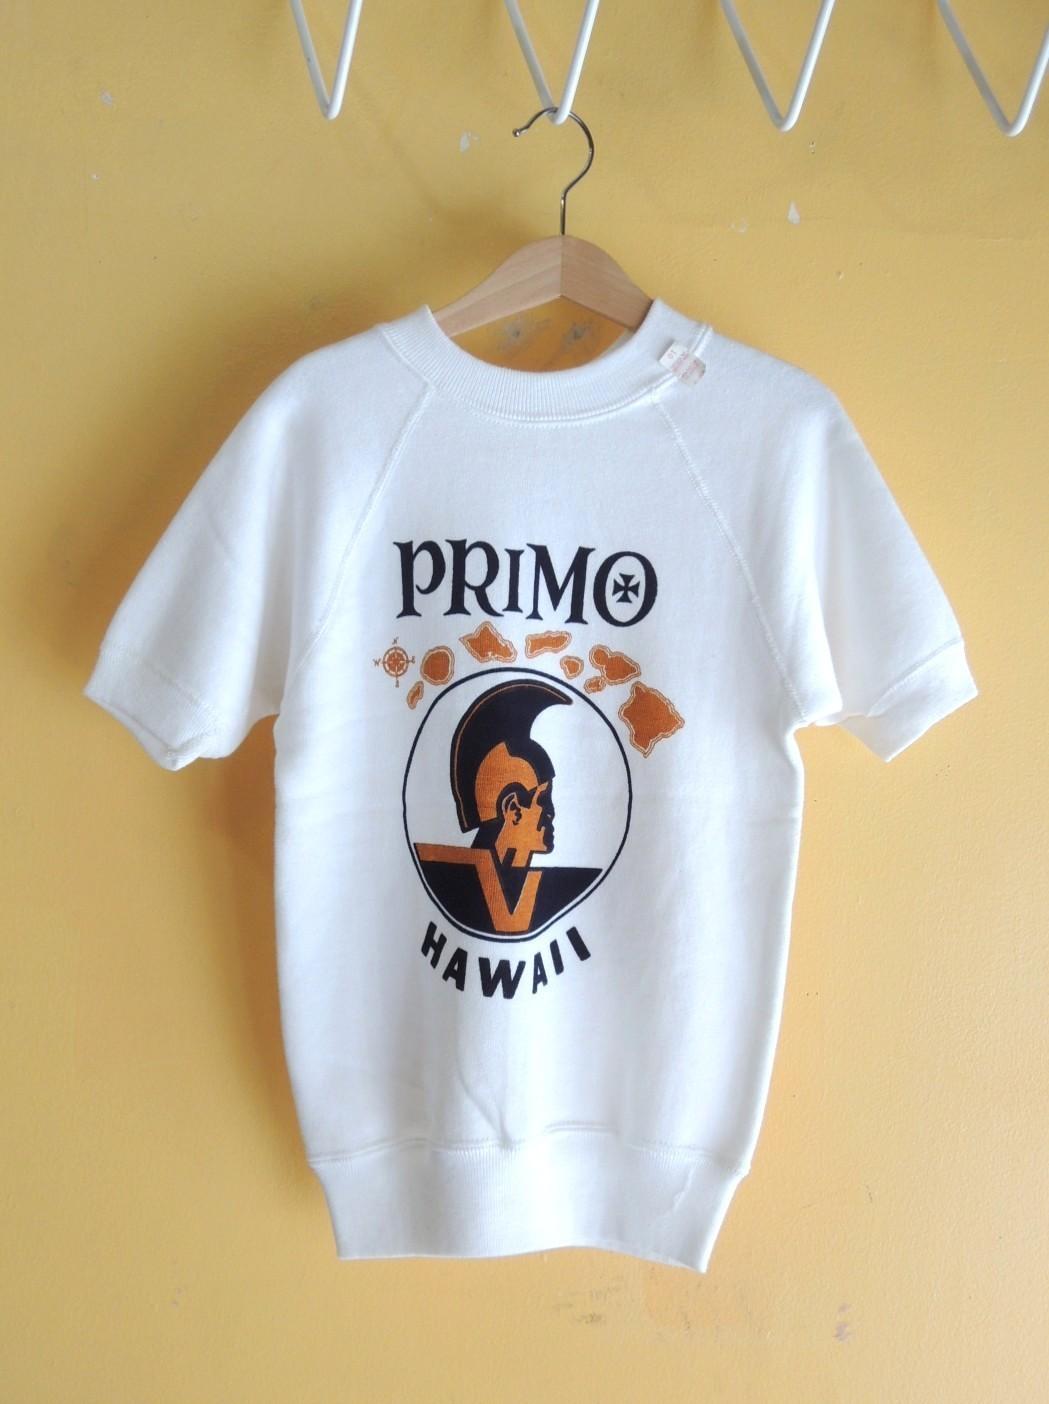 primosweat02.JPG